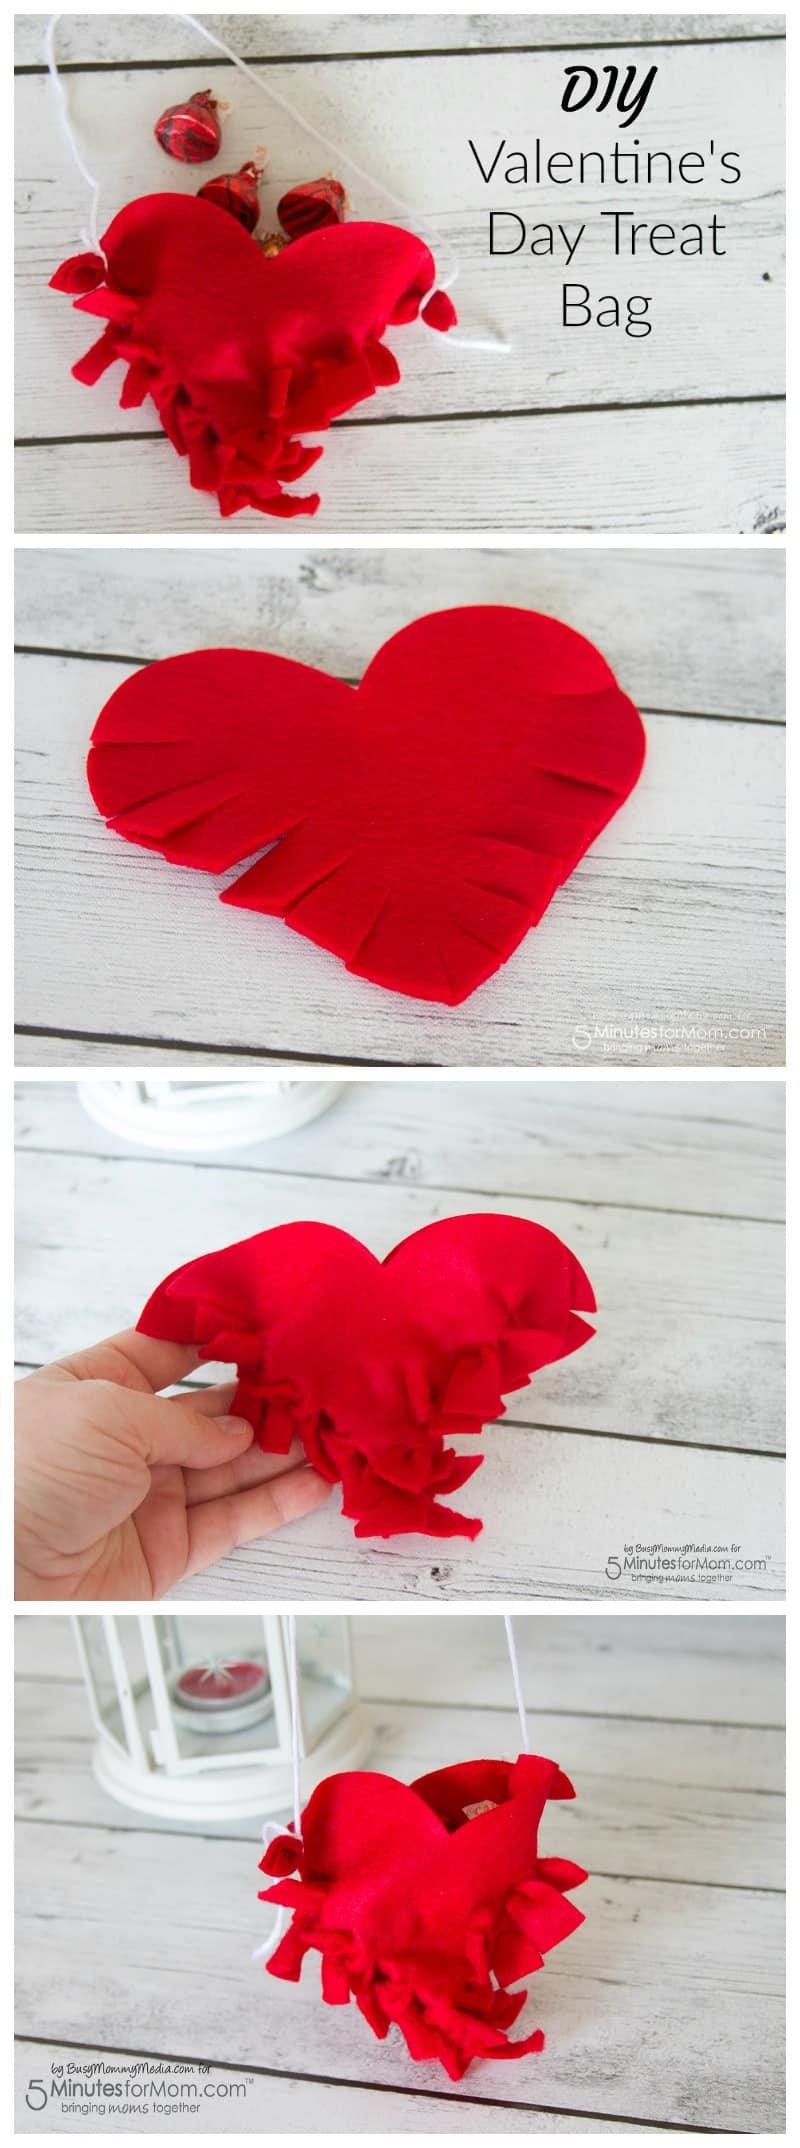 DIY Valentines Day Treat Blog